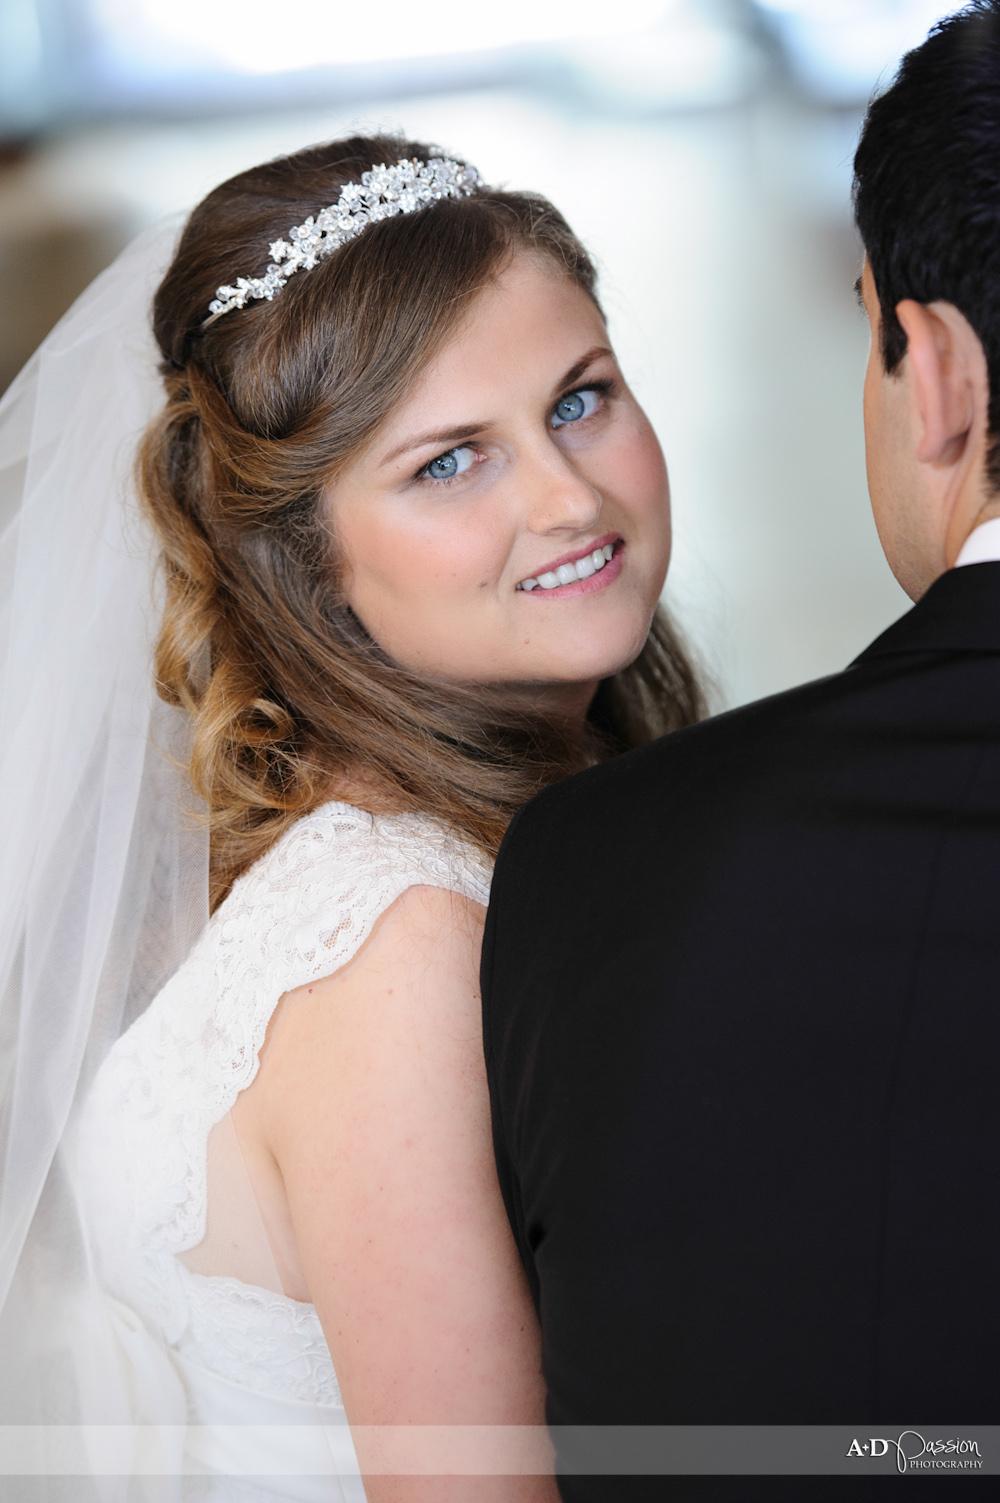 AD Passion Photography | ad-passion.com_fotograf-profesionist-nunta-spania_alice-si-eugen_0025 | Adelin, Dida, fotograf profesionist, fotograf de nunta, fotografie de nunta, fotograf Timisoara, fotograf Craiova, fotograf Bucuresti, fotograf Arad, nunta Timisoara, nunta Arad, nunta Bucuresti, nunta Craiova